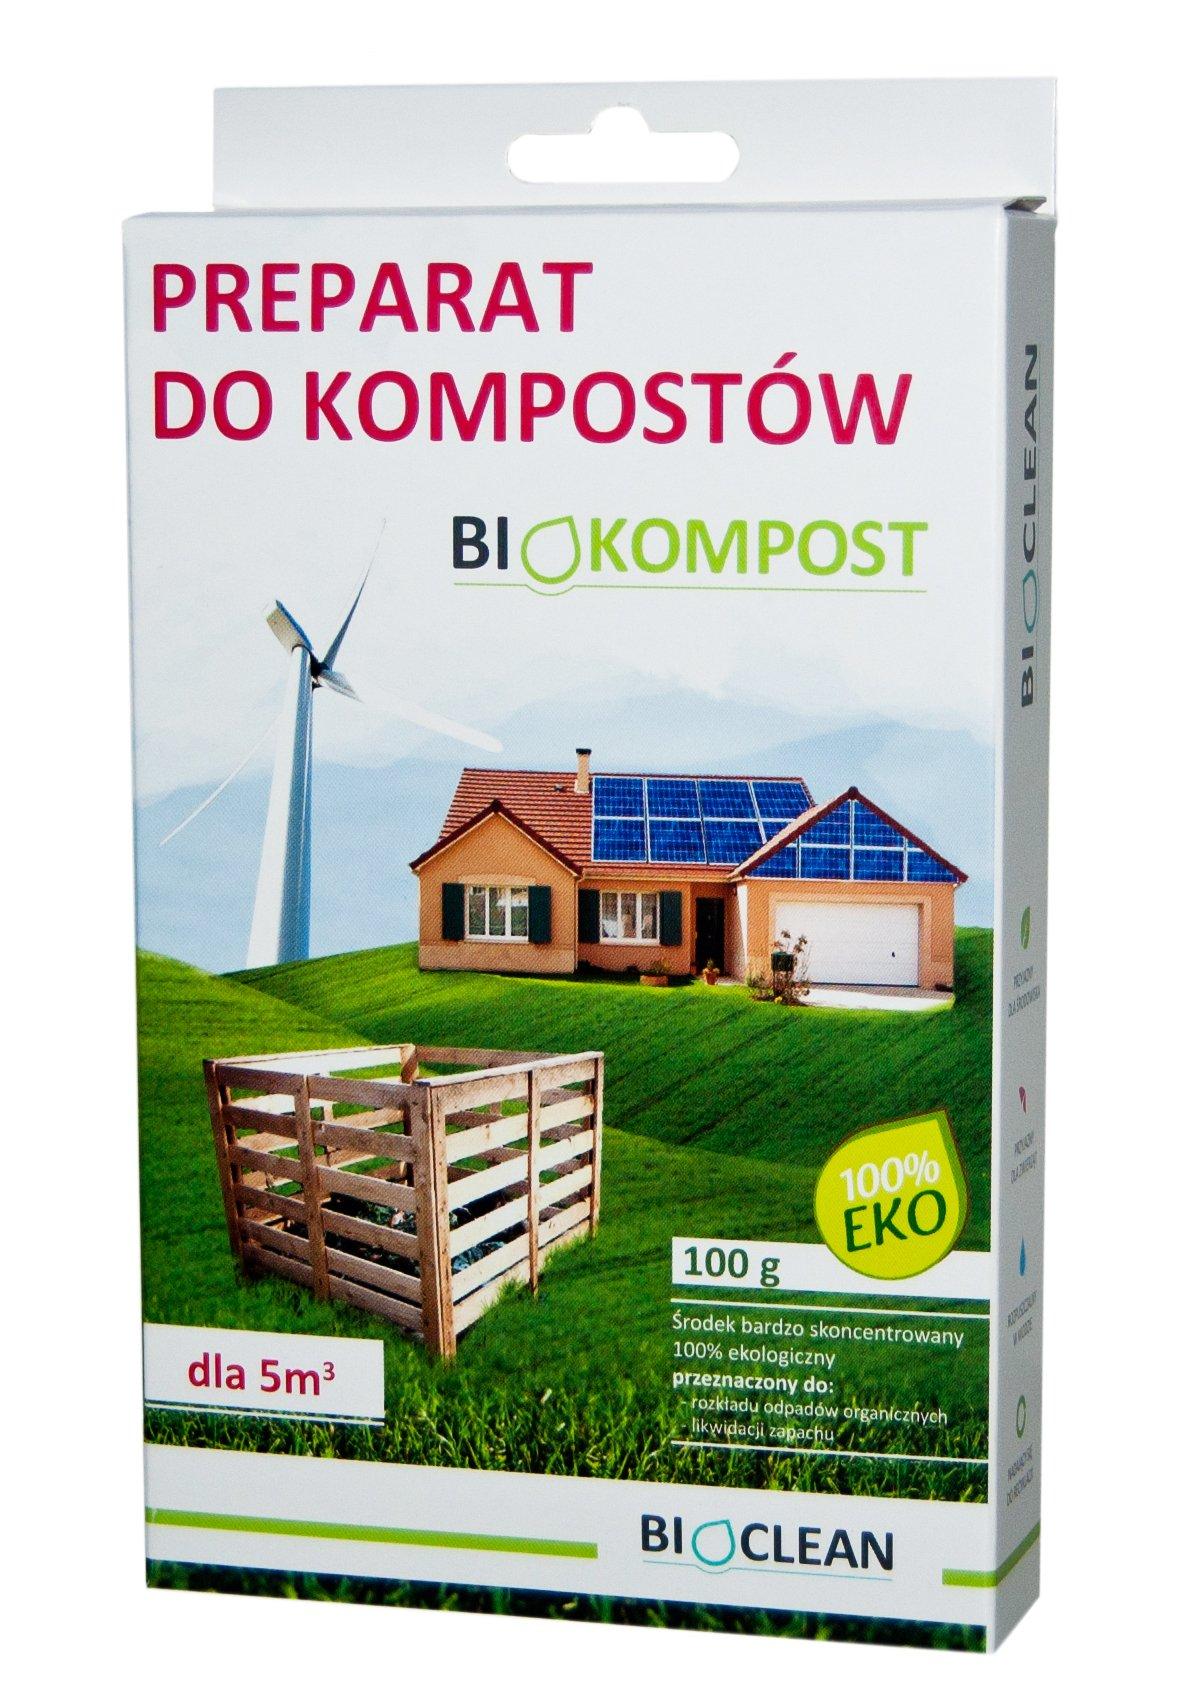 BIOKOMPOST 100g preparat do kompostowania kompost